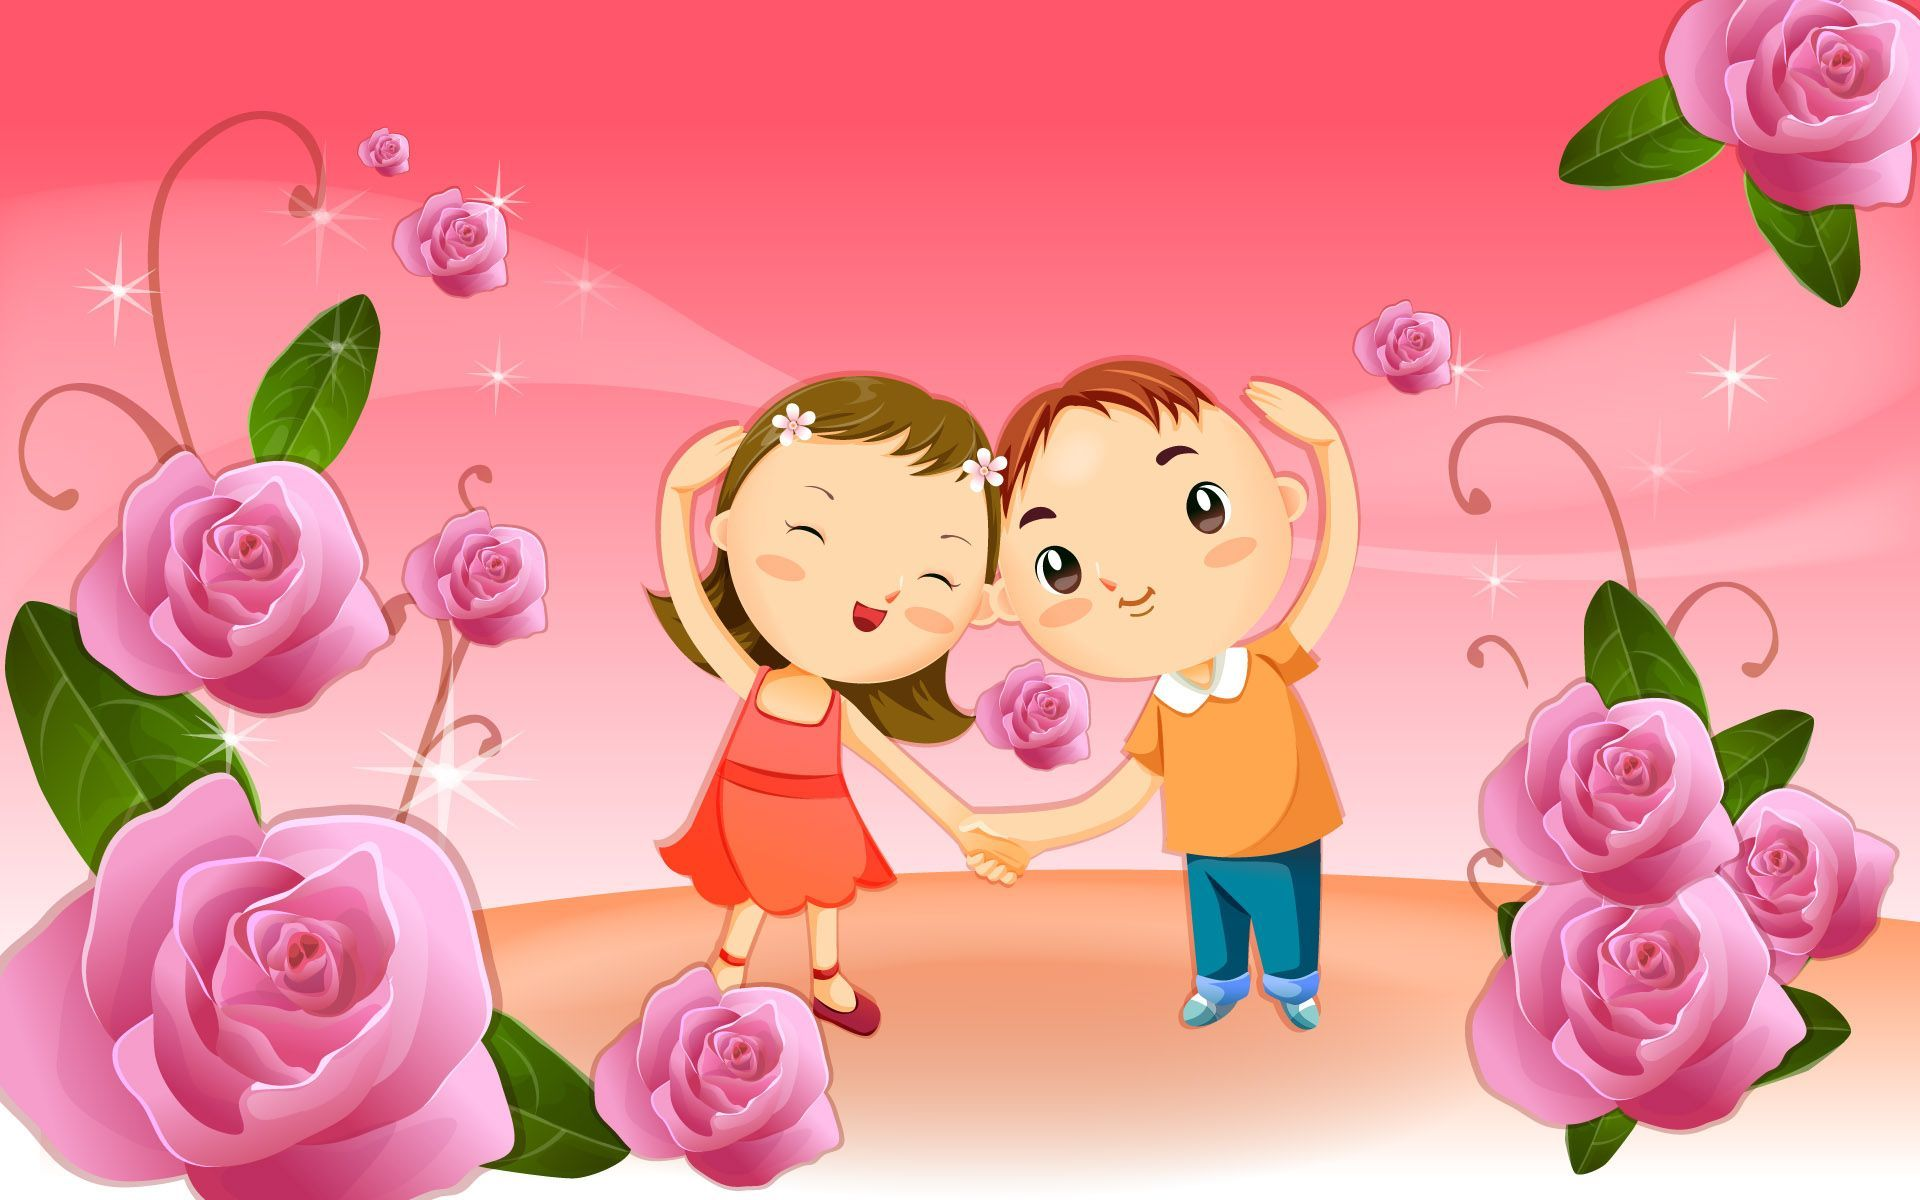 Love Cartoon Wallpapers Wallpaper Cave Happy Friendship Day Friendship Day Wallpaper Friendship Wallpaper